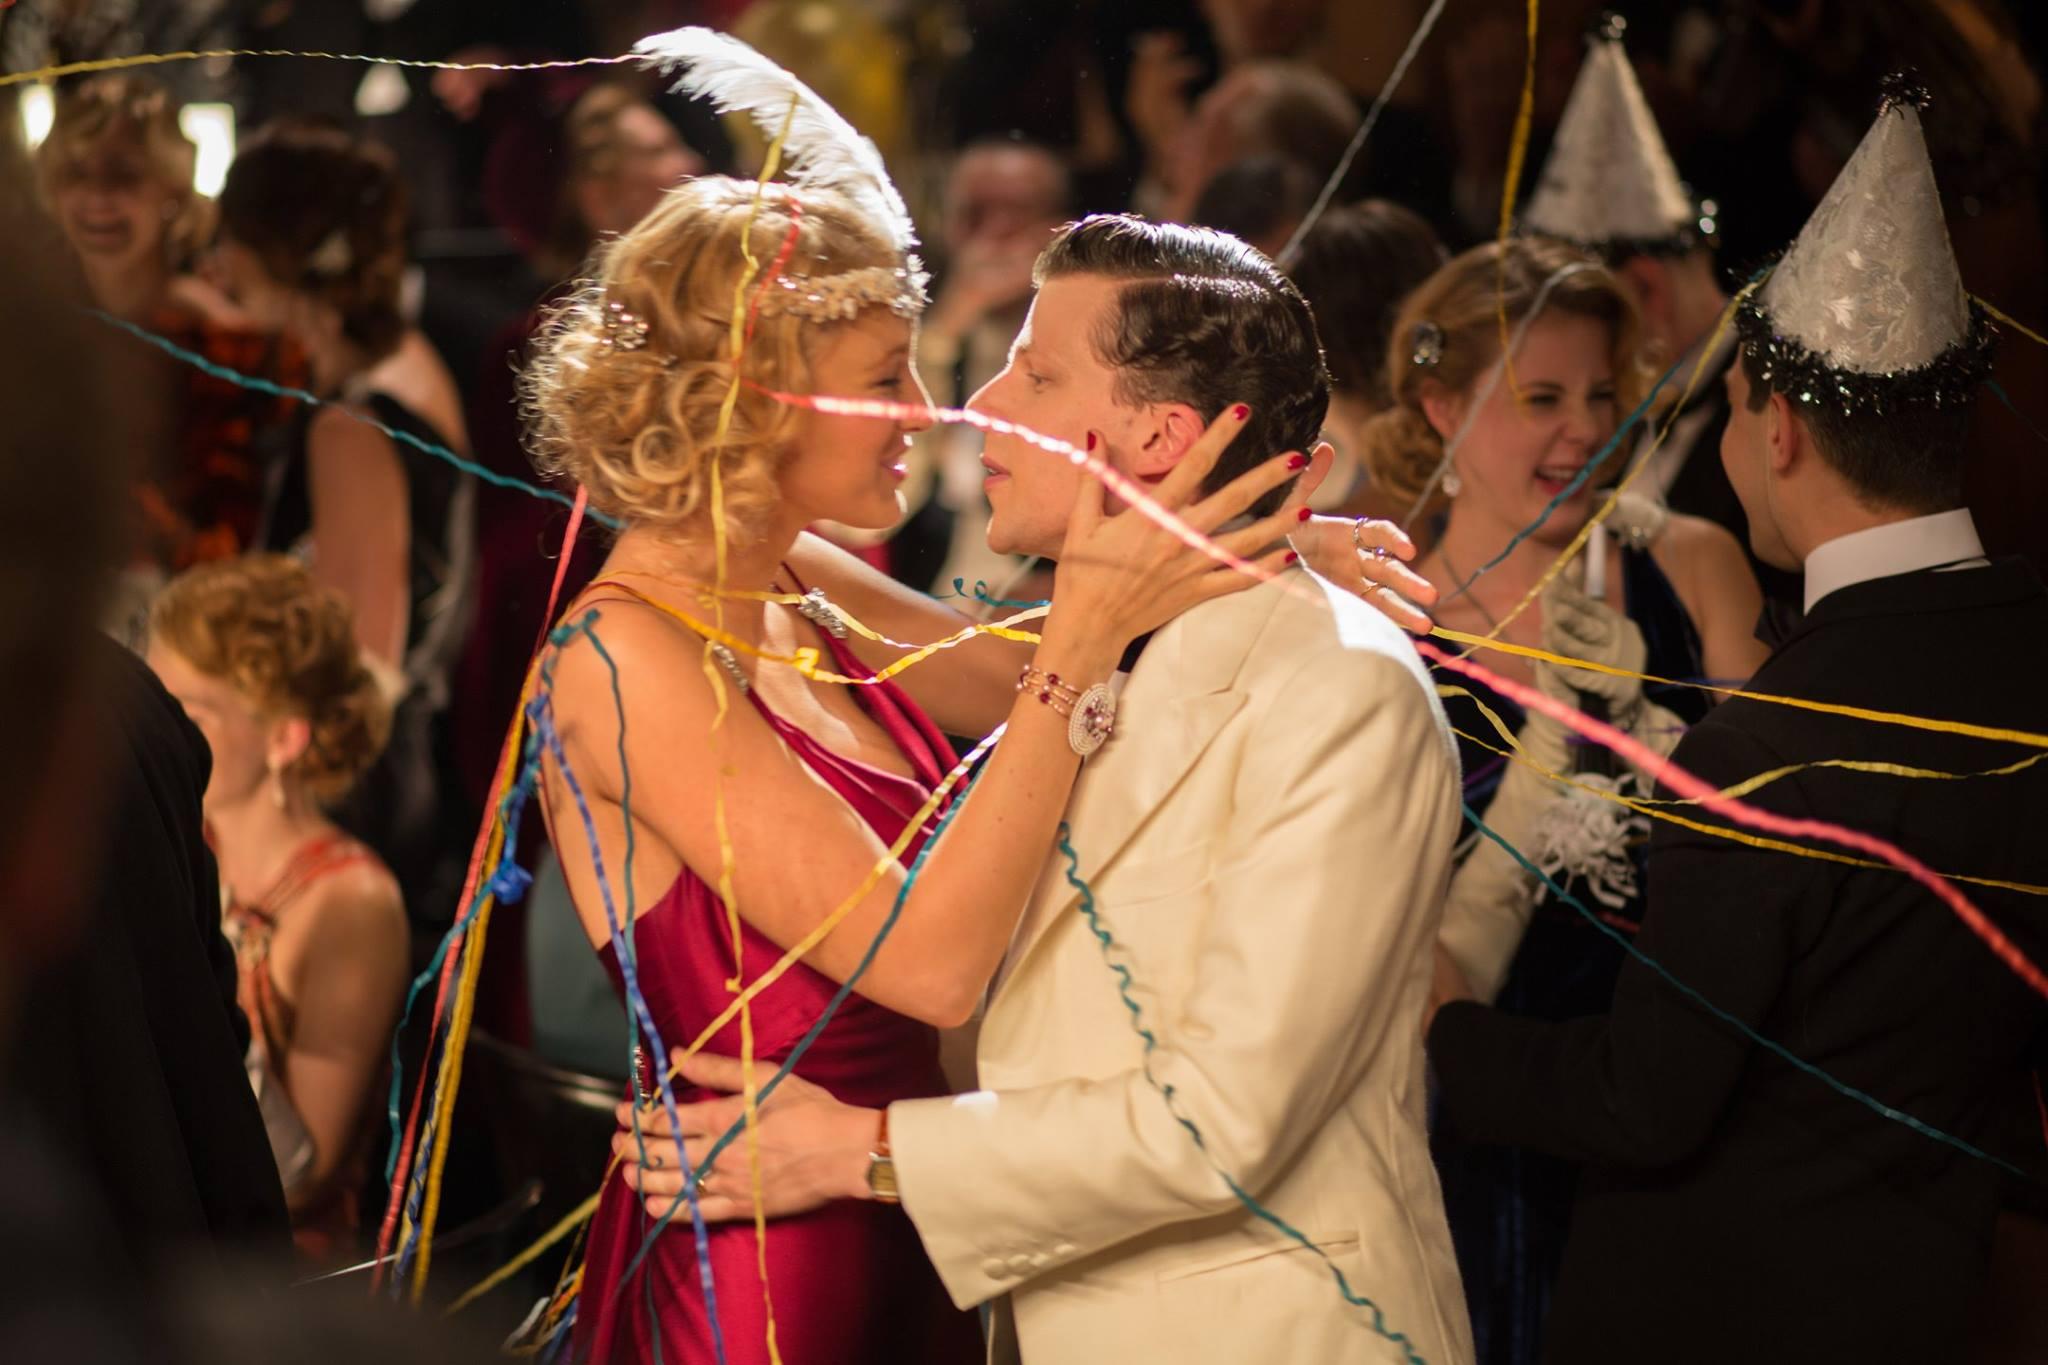 """Cafè Society"": splendida cornice per i temi cari a Woody Allen"